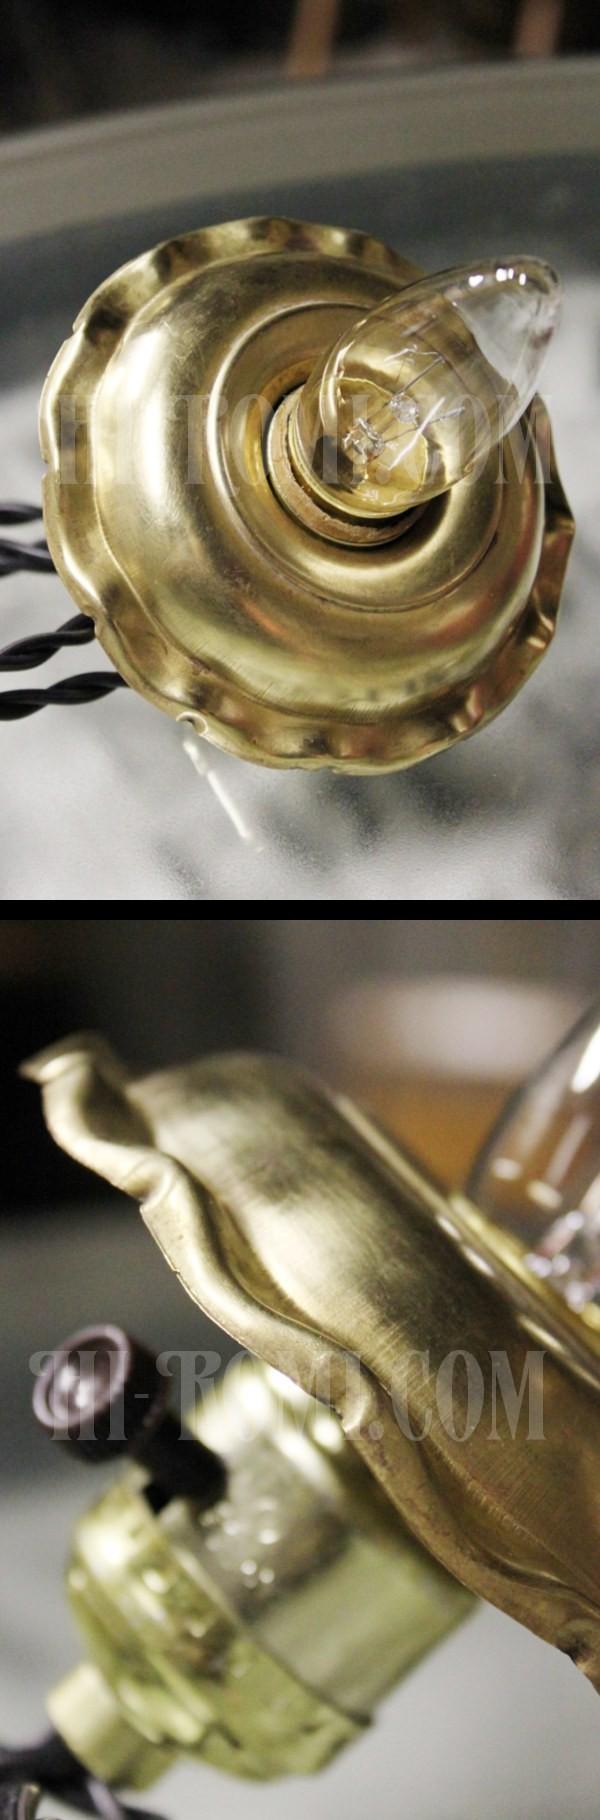 USAサークルFヴィンテージターン式アルミ製ソケット花フレーム付ペンダントライト(1)/アンティーク照明ランプ工業系